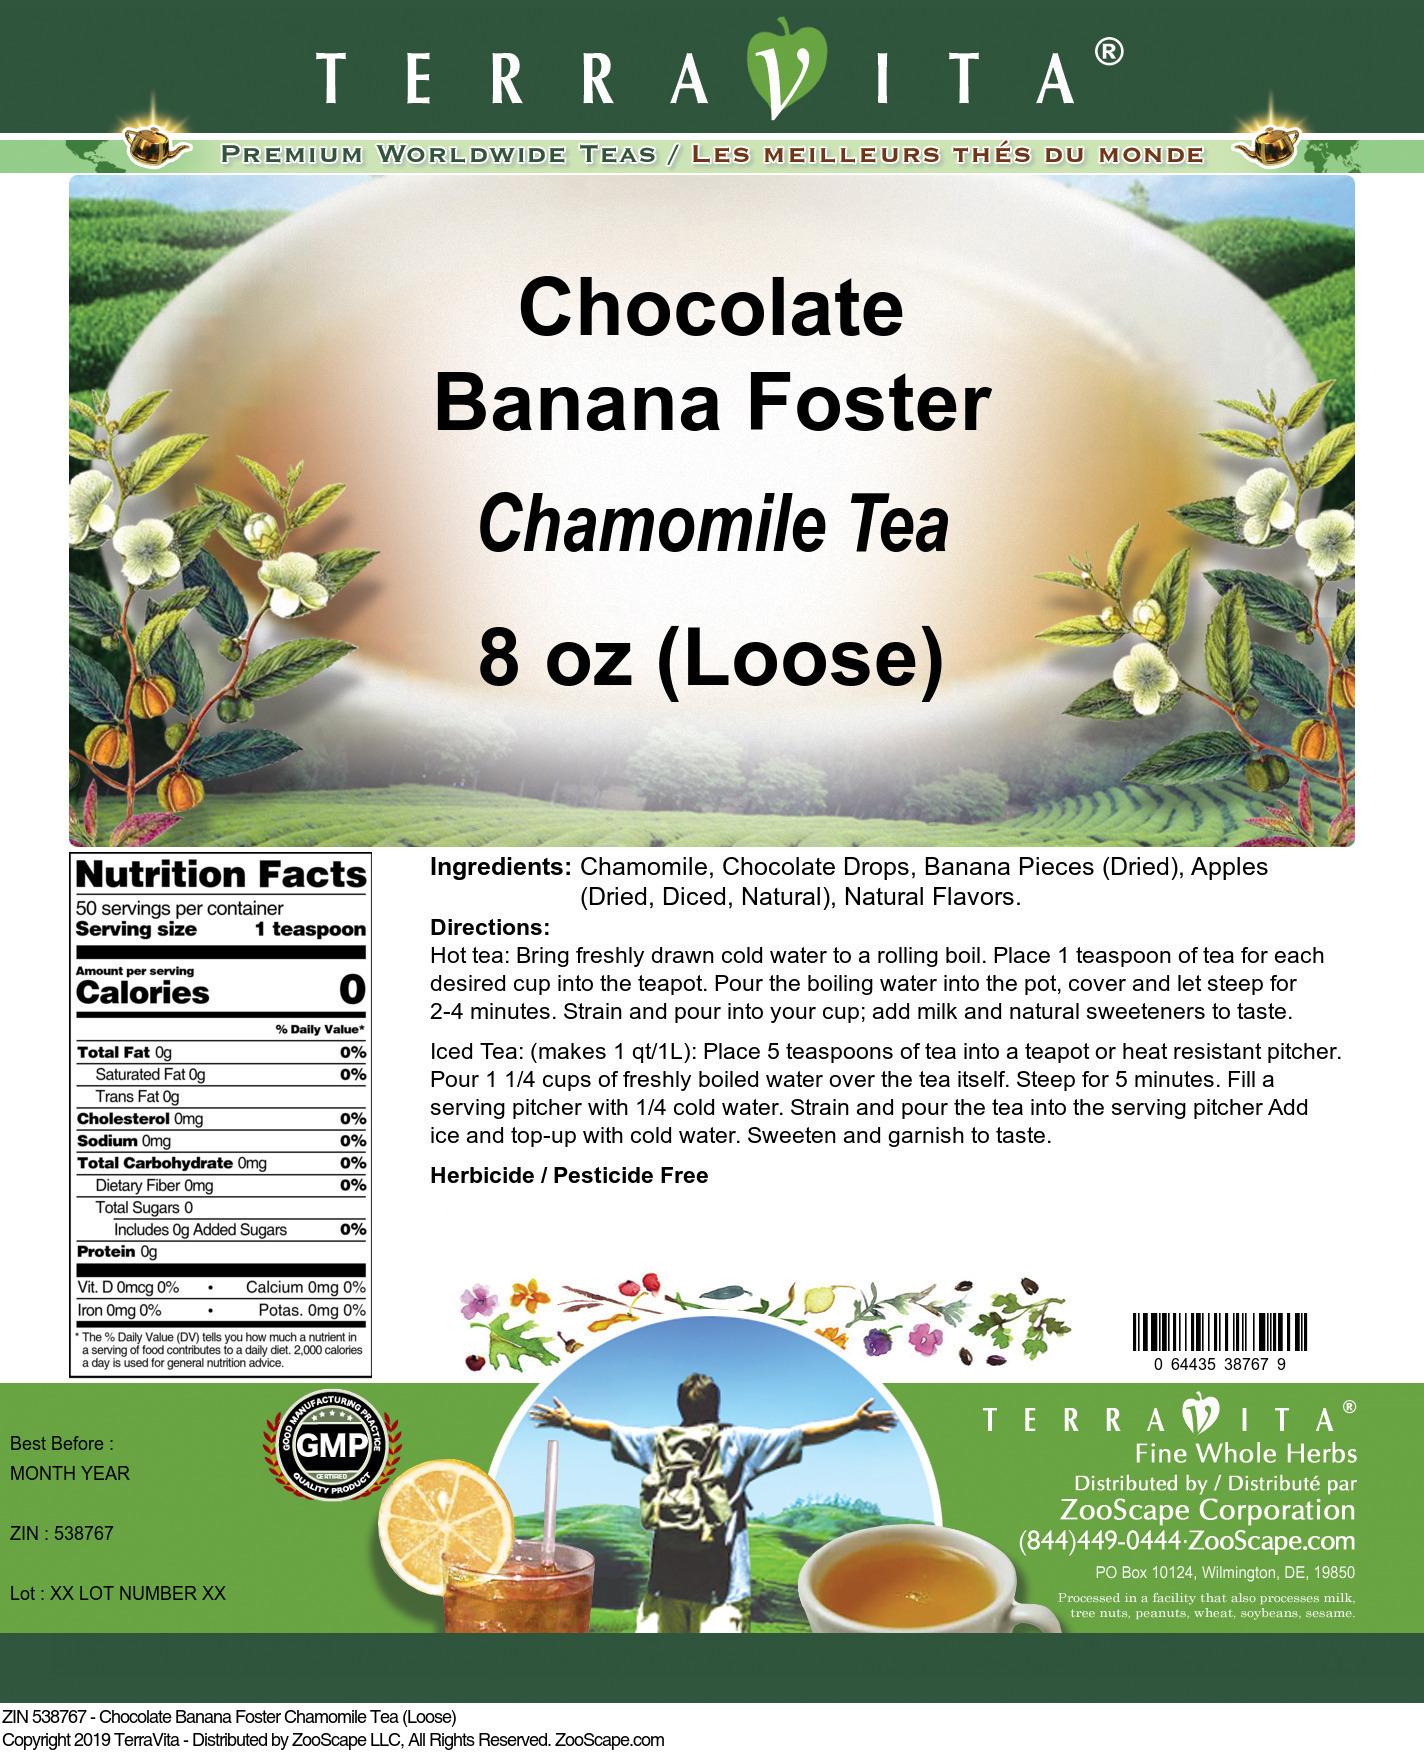 Chocolate Banana Foster Chamomile Tea